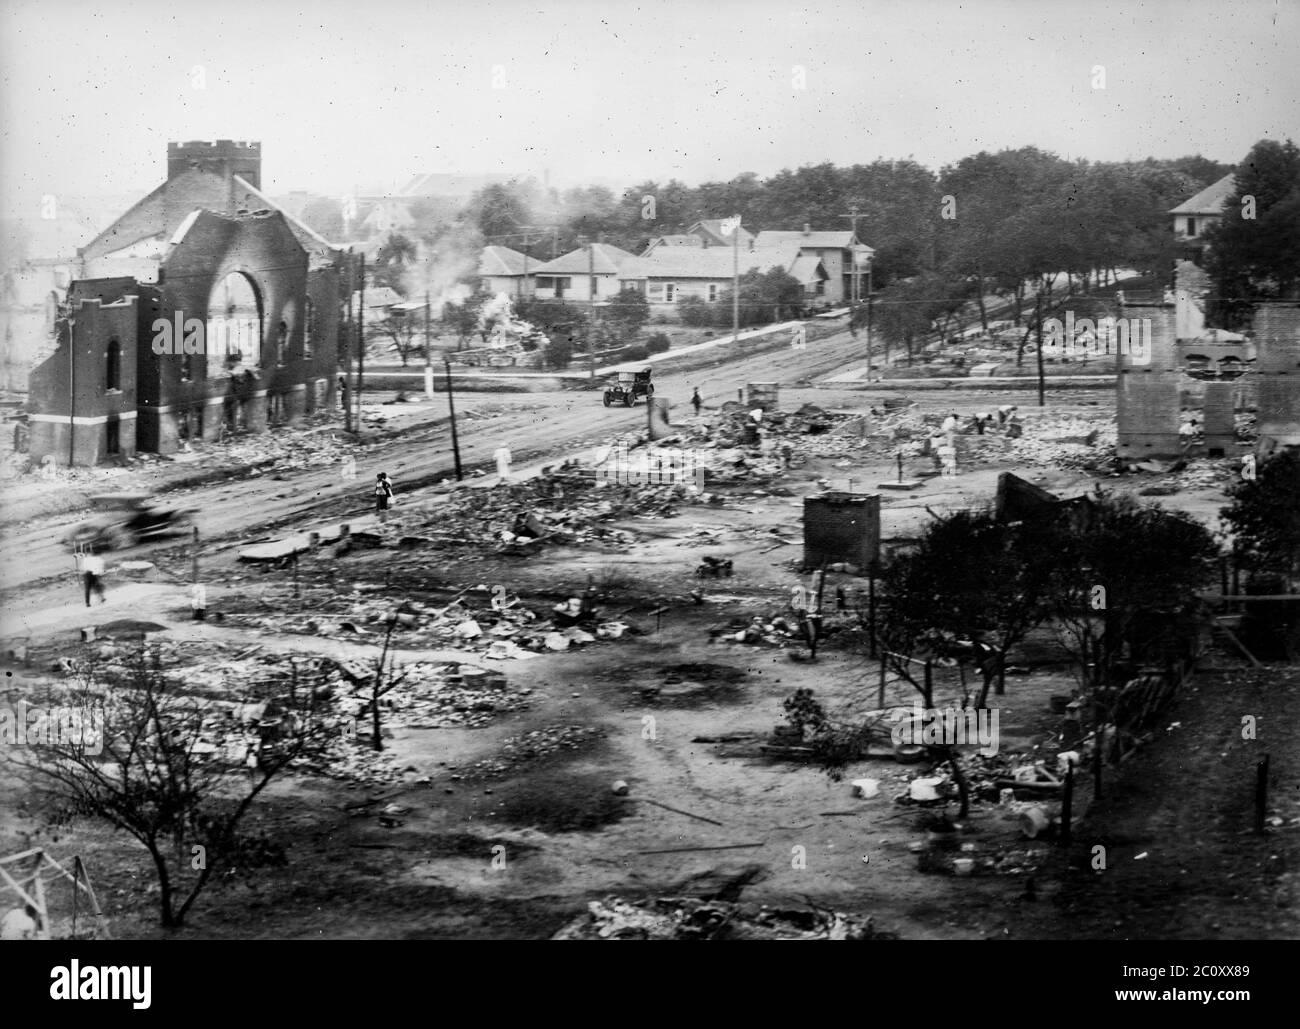 Race riots in Tulsa, Oklahoma on June 21, 1921. Part of district burned in race riots, Tulsa, Okla. Stock Photo